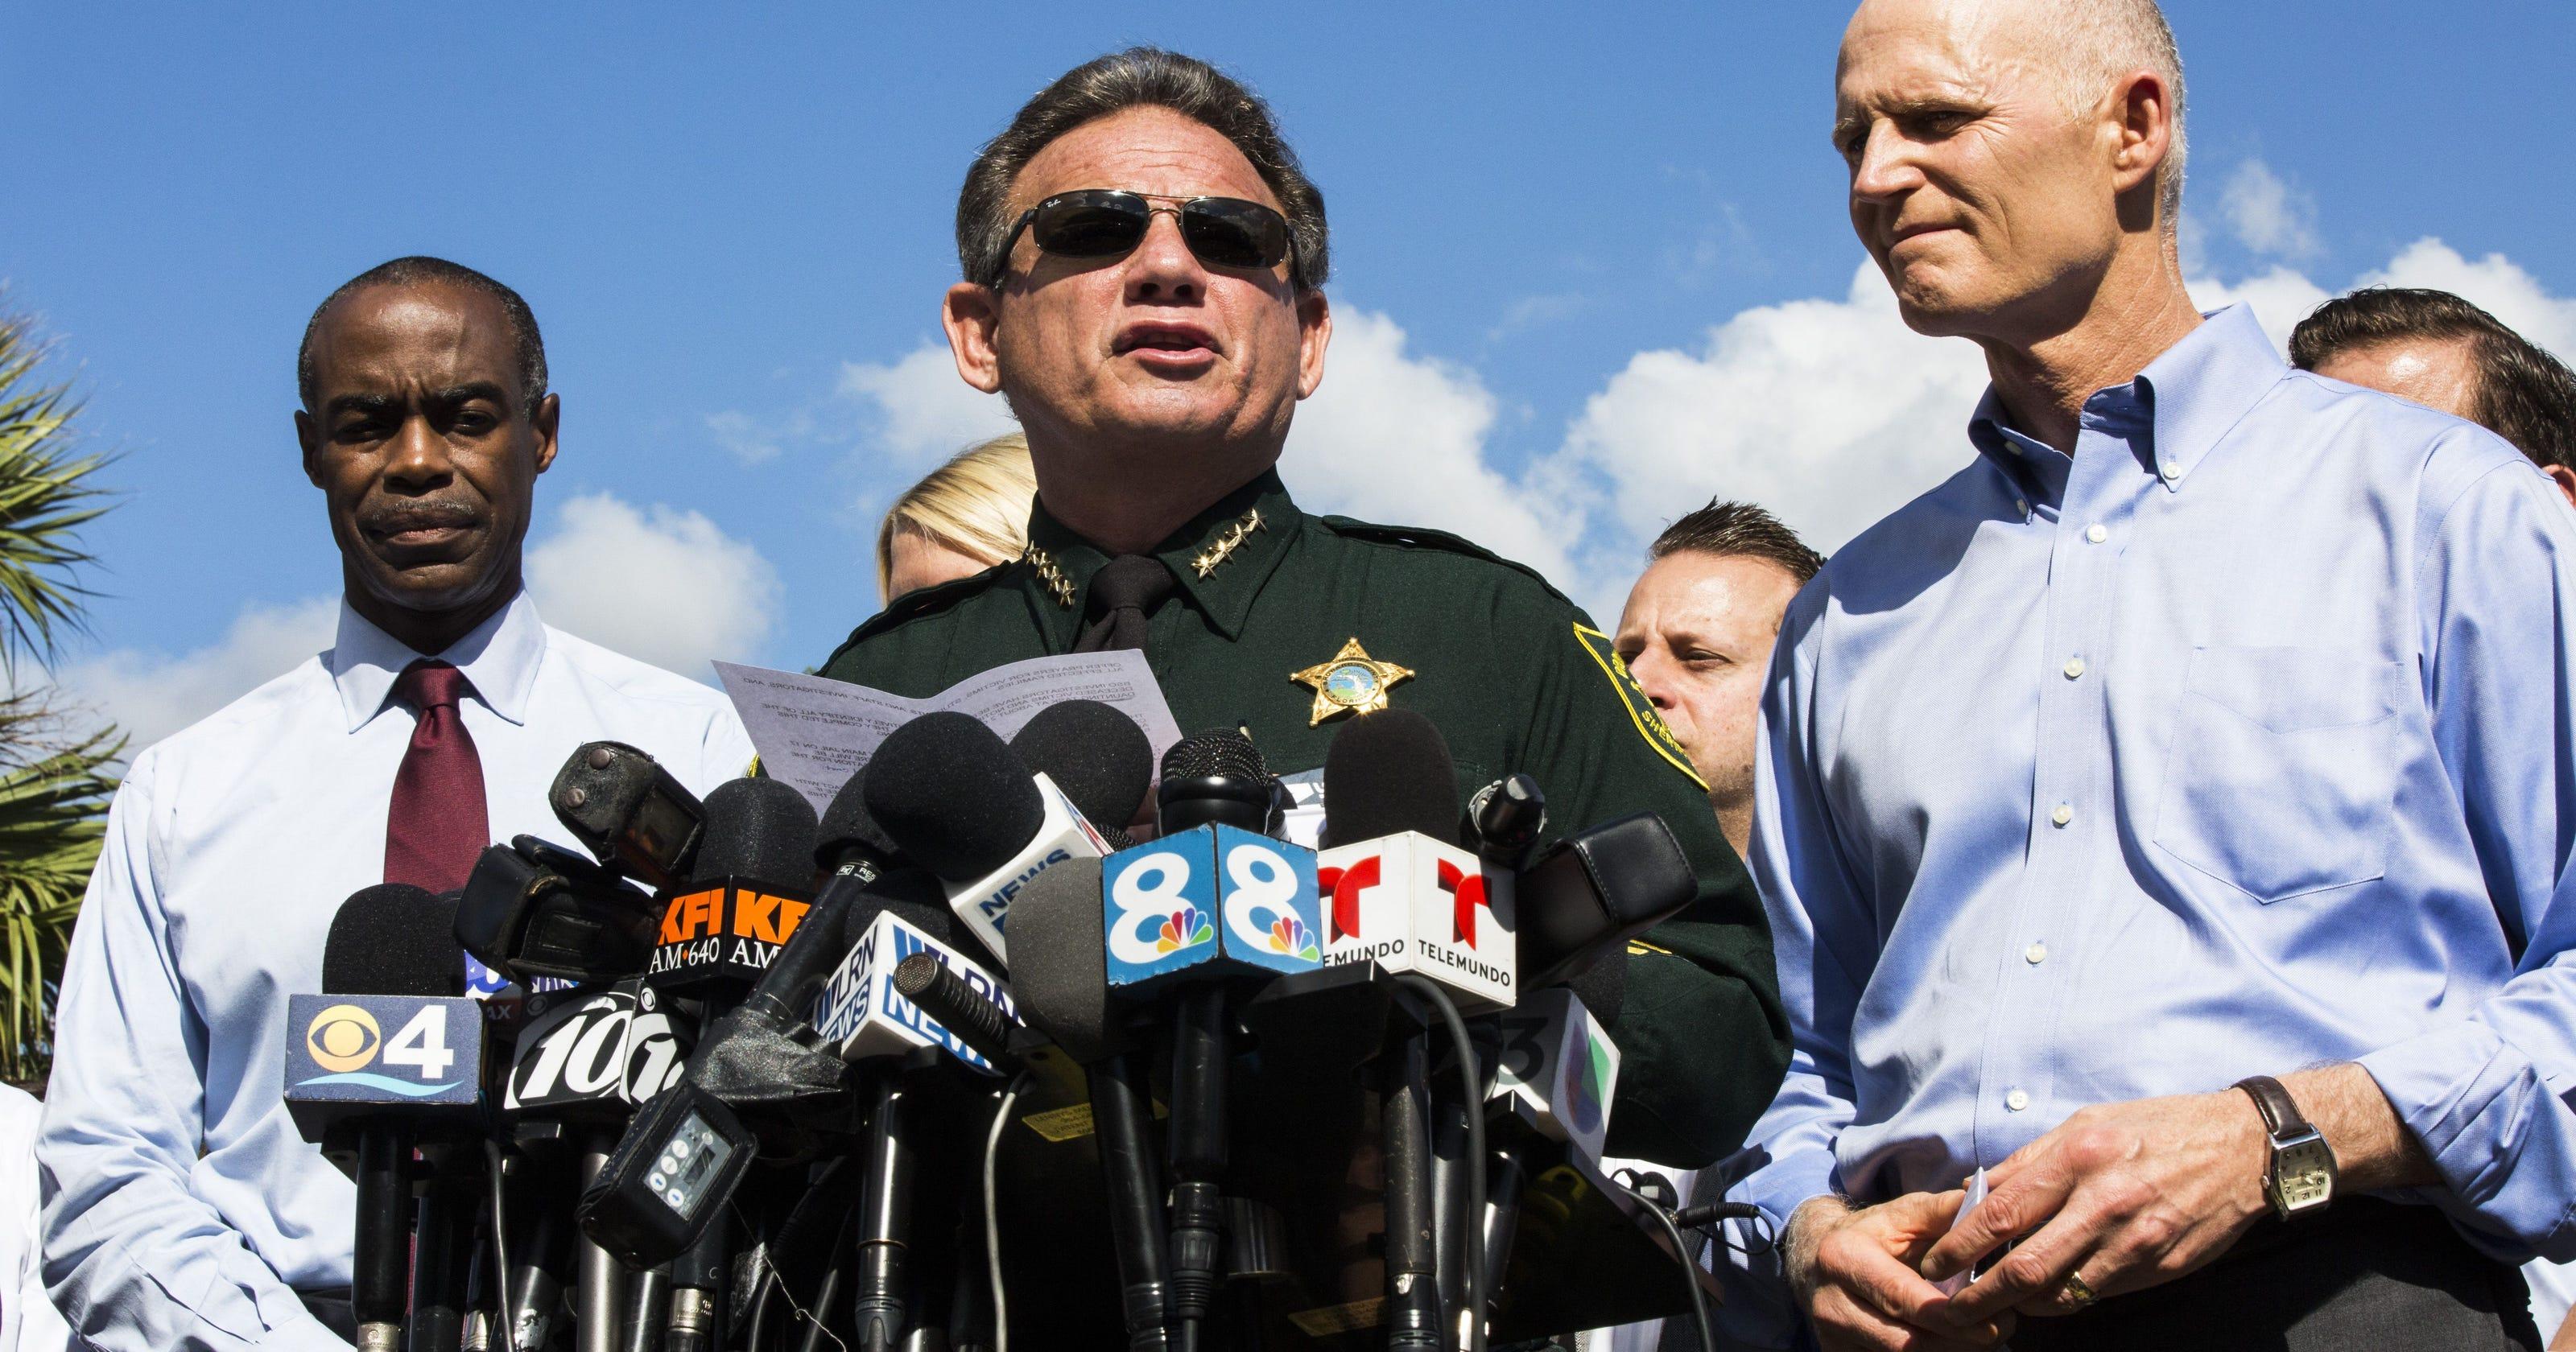 Florida school shooting: Police warned 18 times about Nikolas Cruz